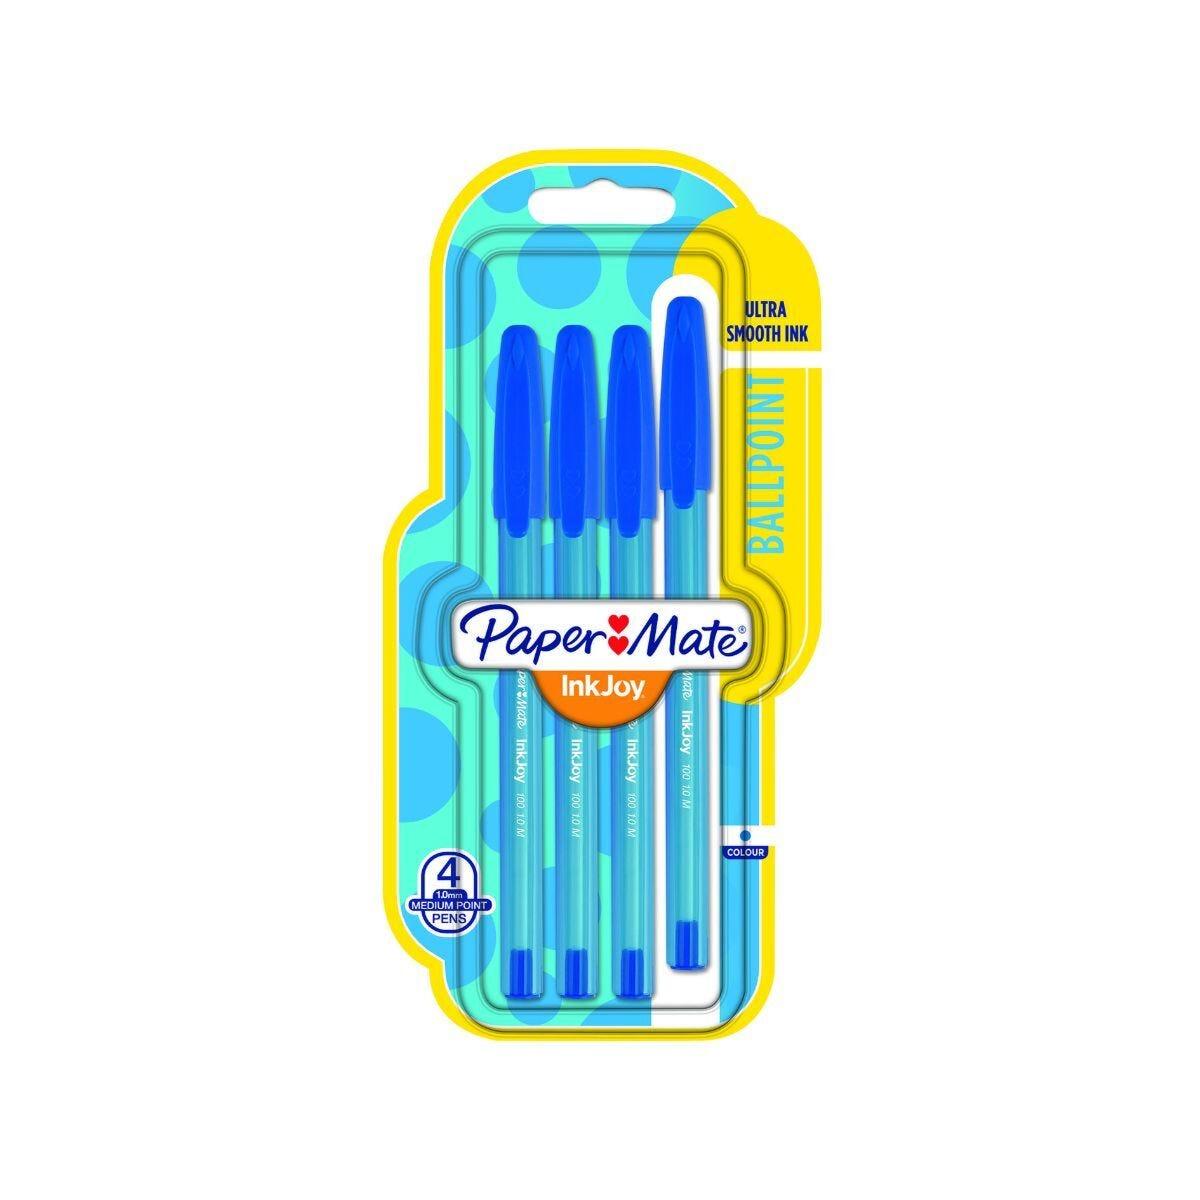 Paper Mate Inkjoy 100 Ball pen Pk4 Blue